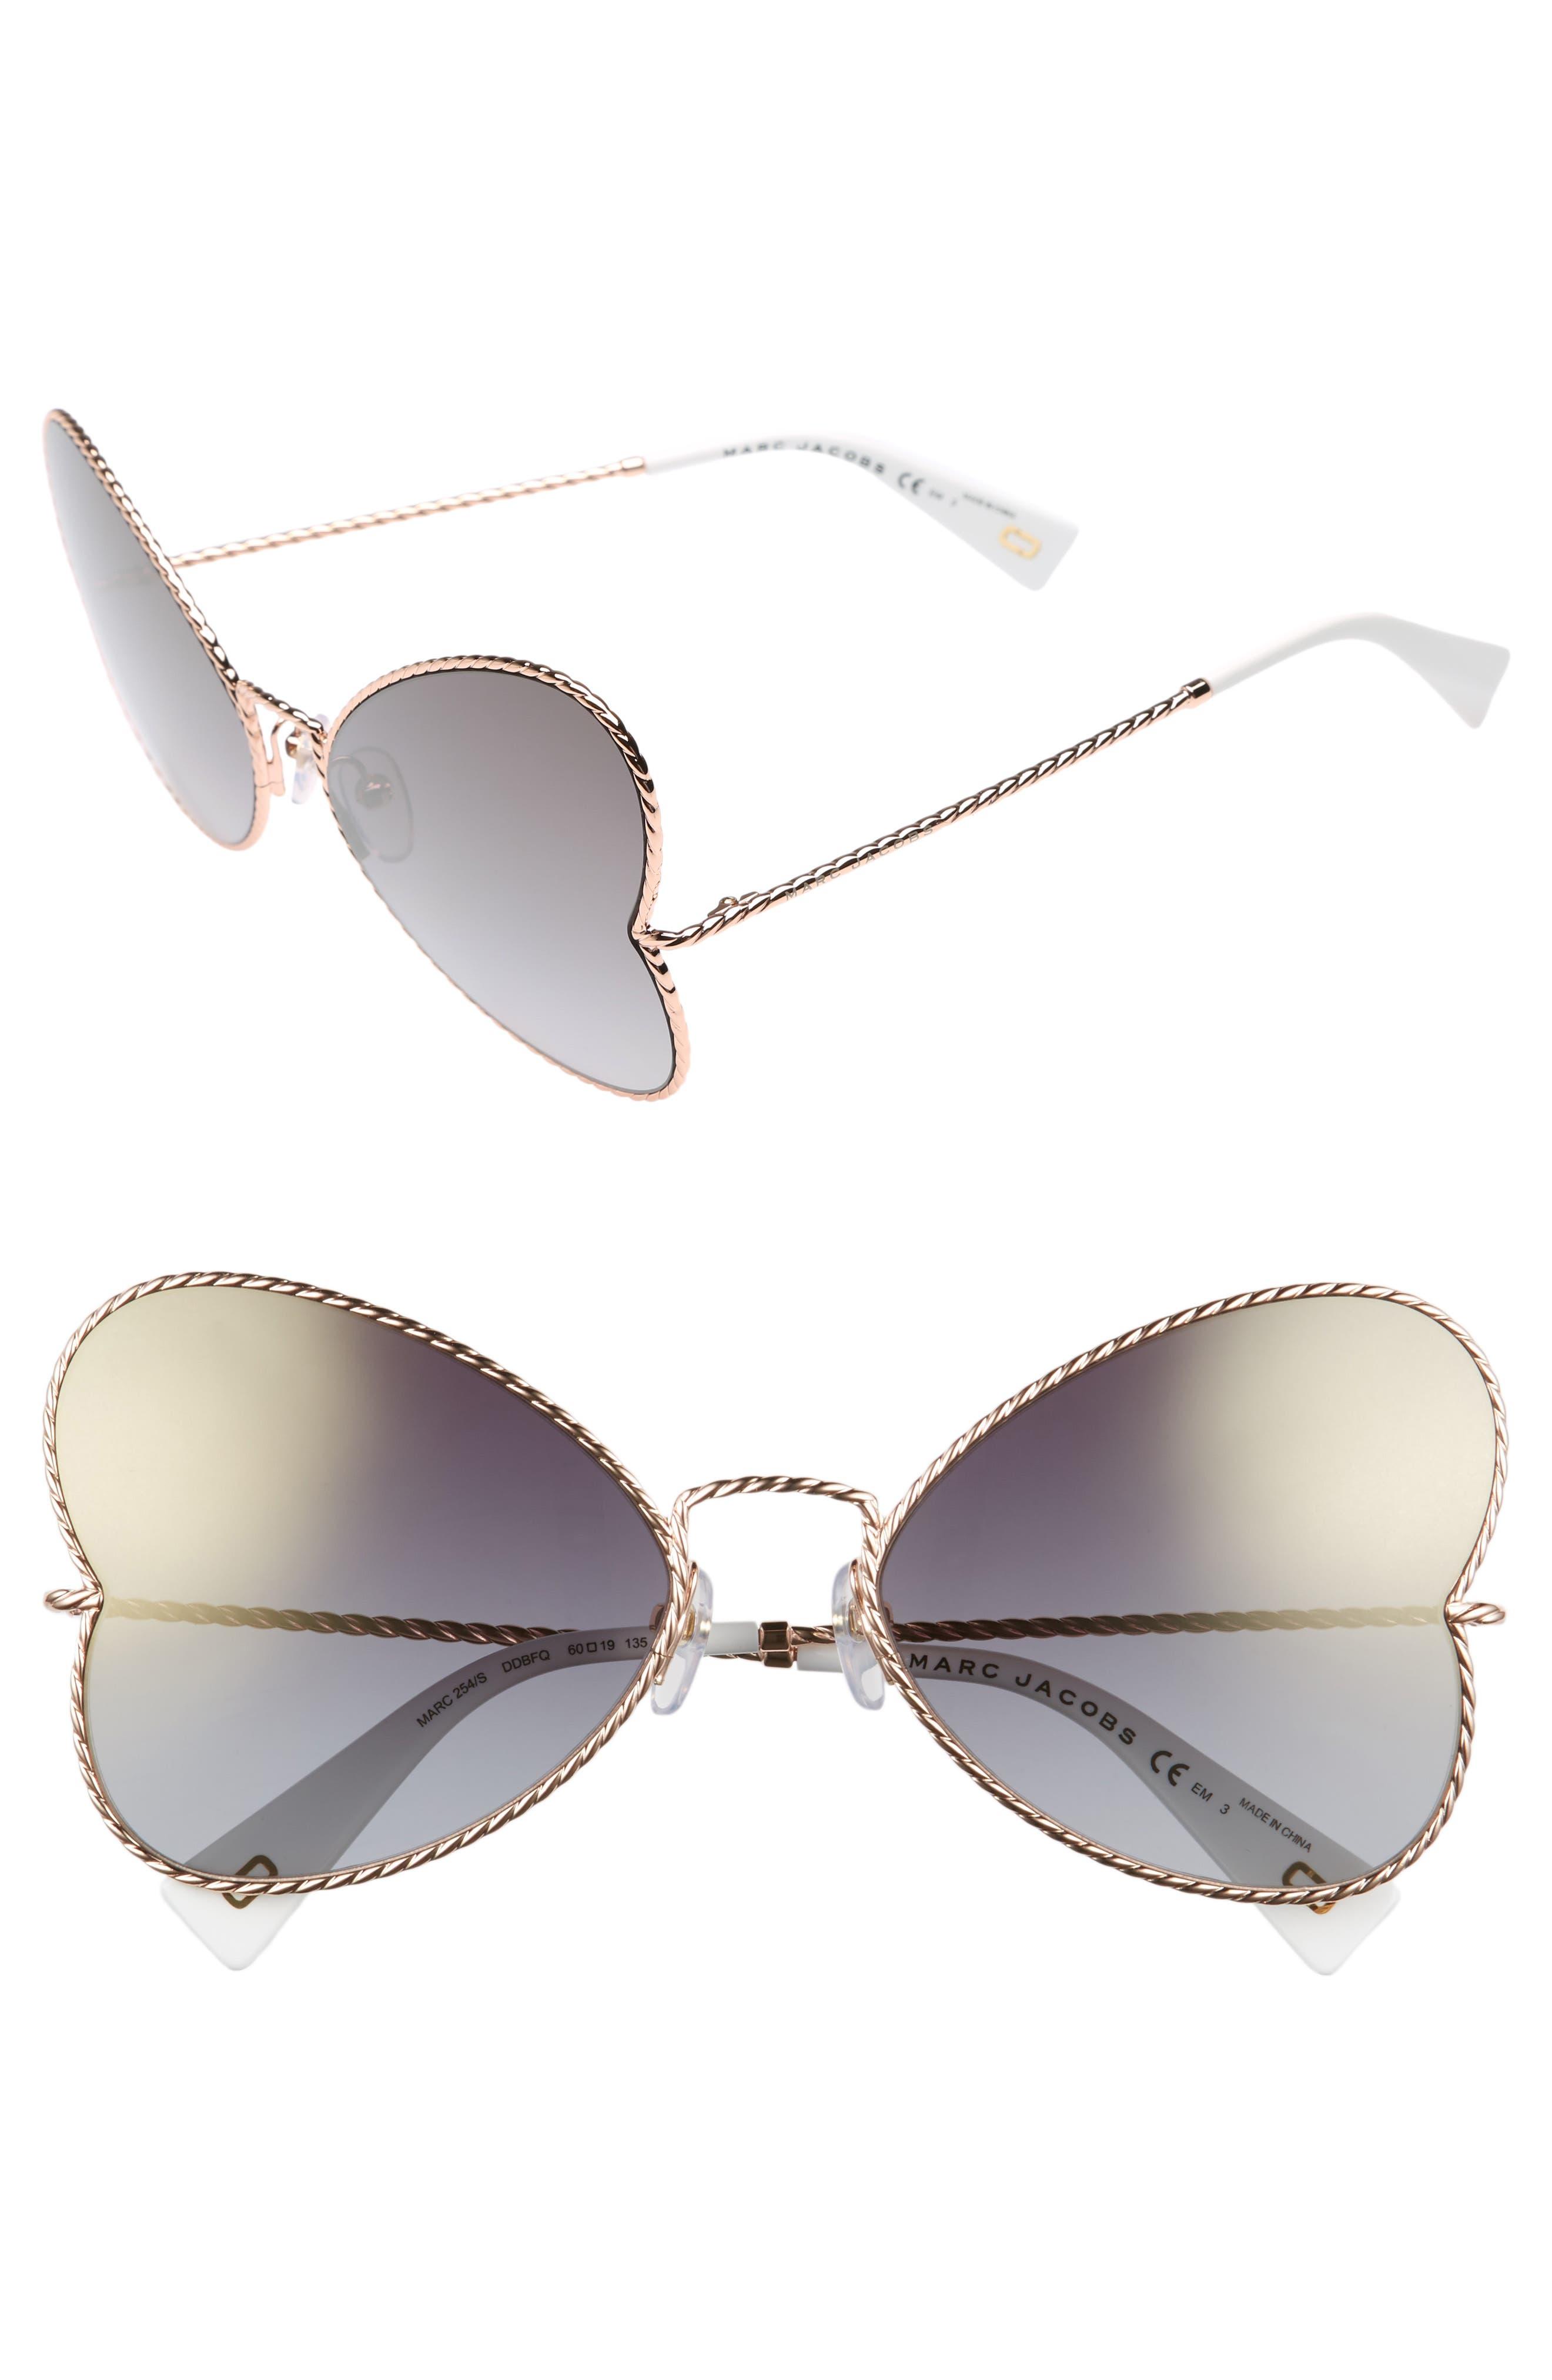 Main Image - MARC JACOBS 60mm Heart Sunglasses